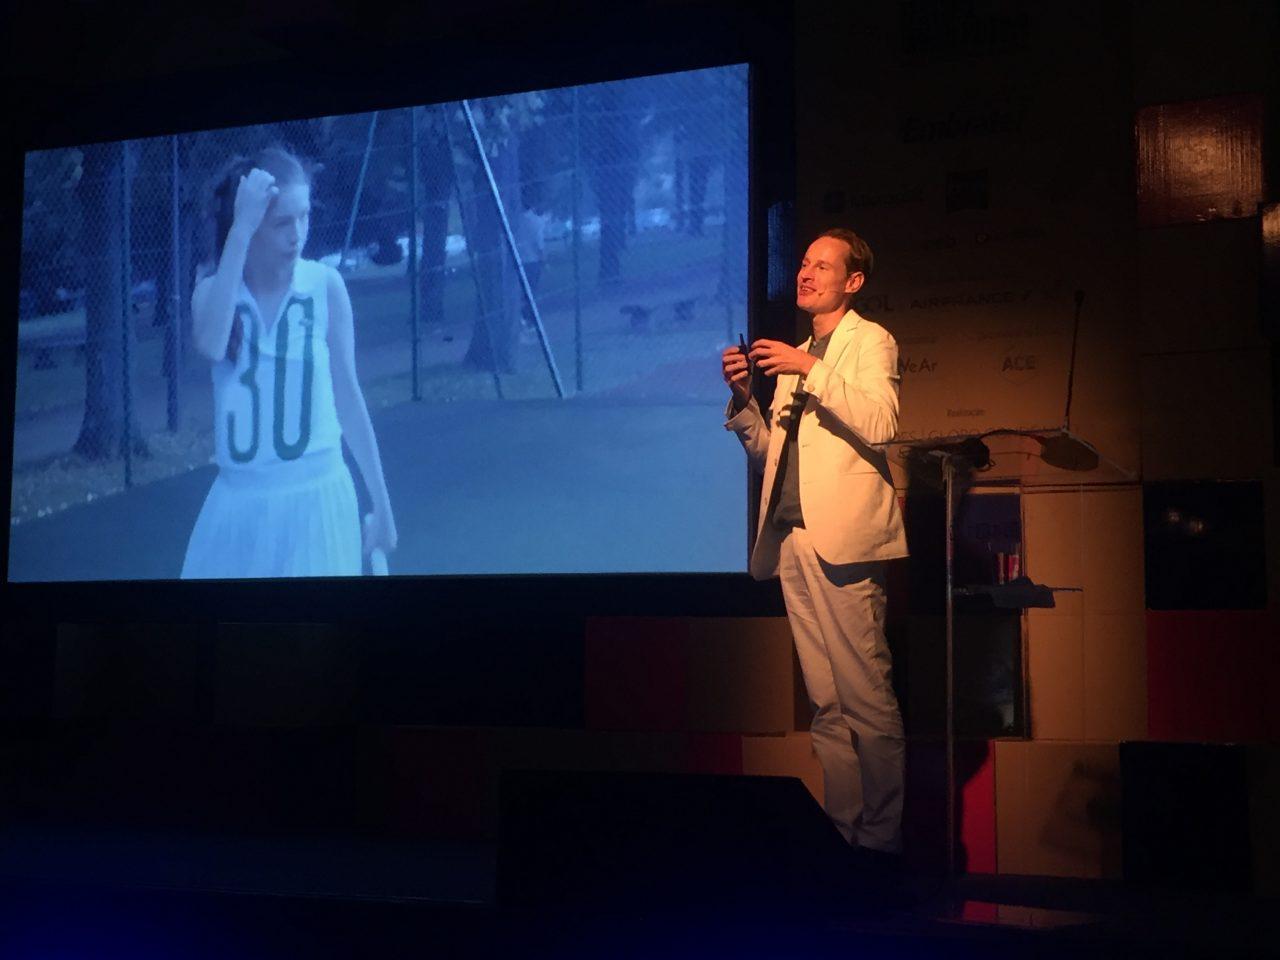 Dan Roosegaarde fala no Wired Festival. Foto: Vanessa Mathias